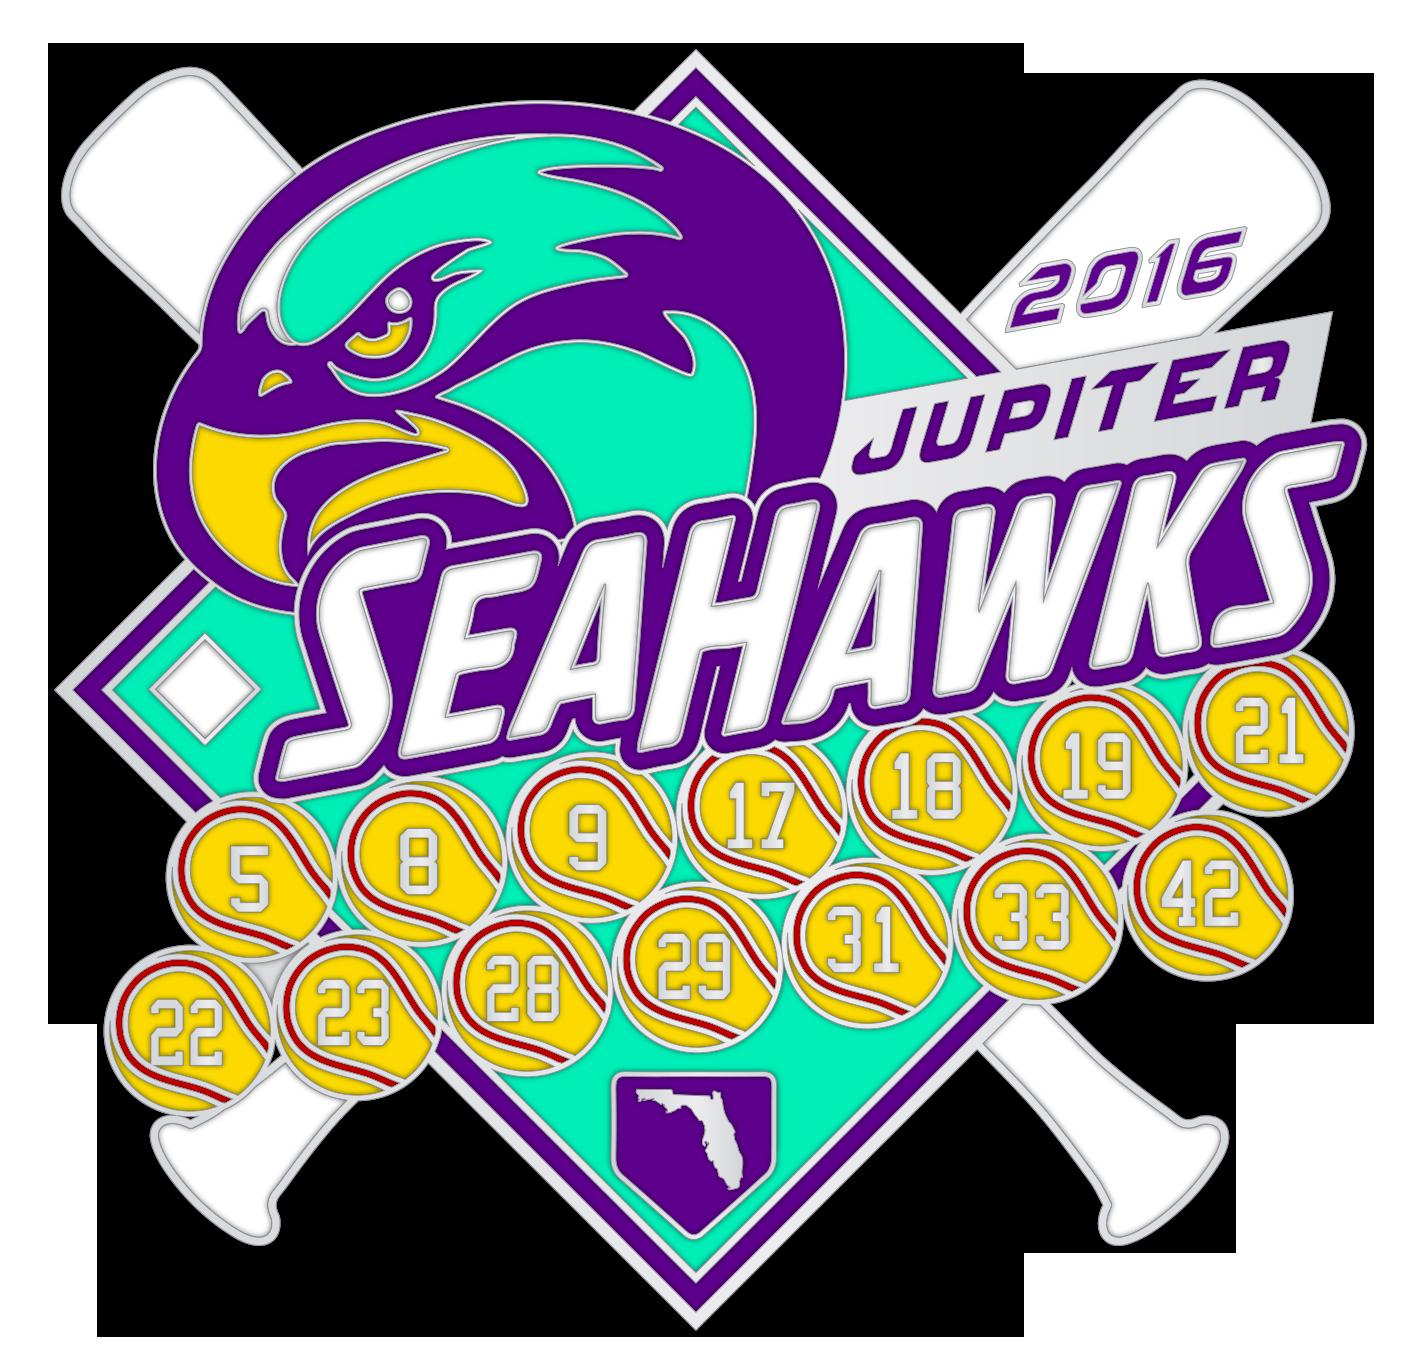 jupiter seahawks custom softball trading pins.png